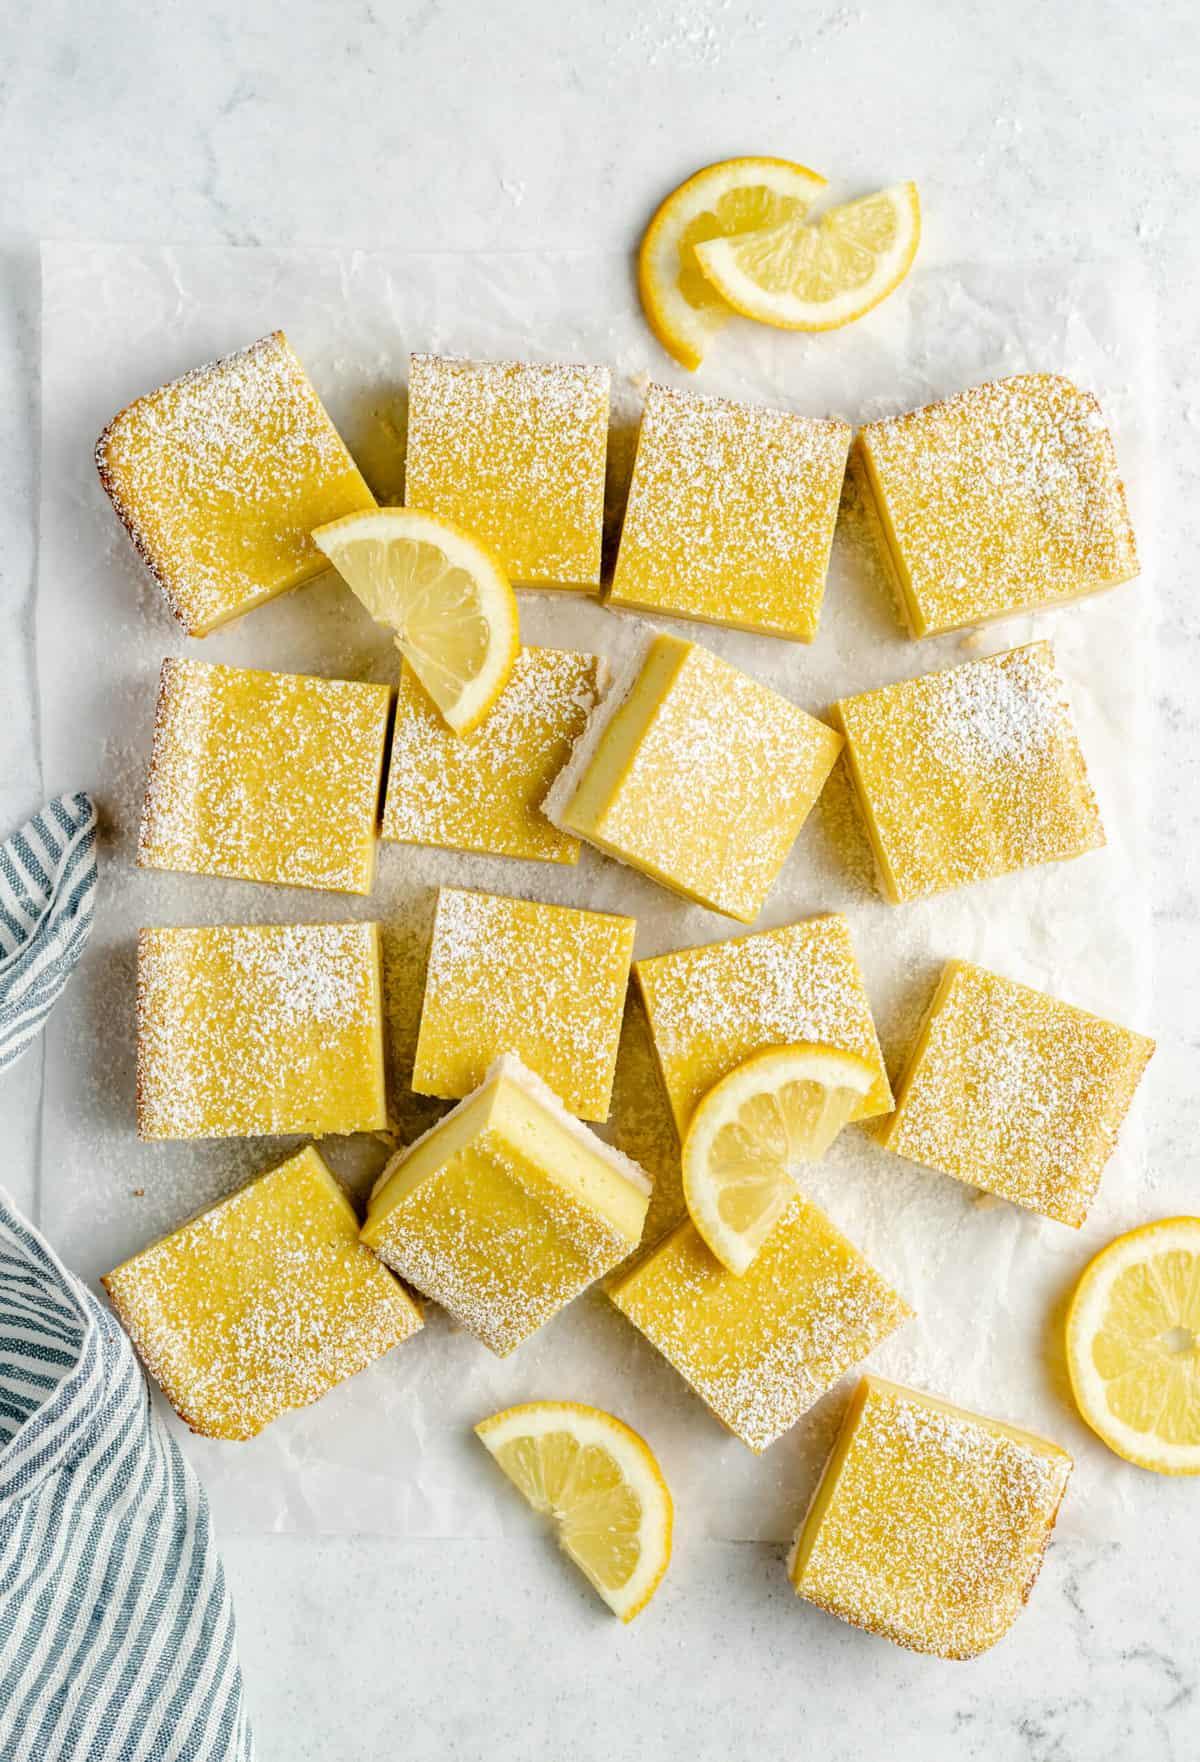 Vegan lemon squares with powdered sugar.